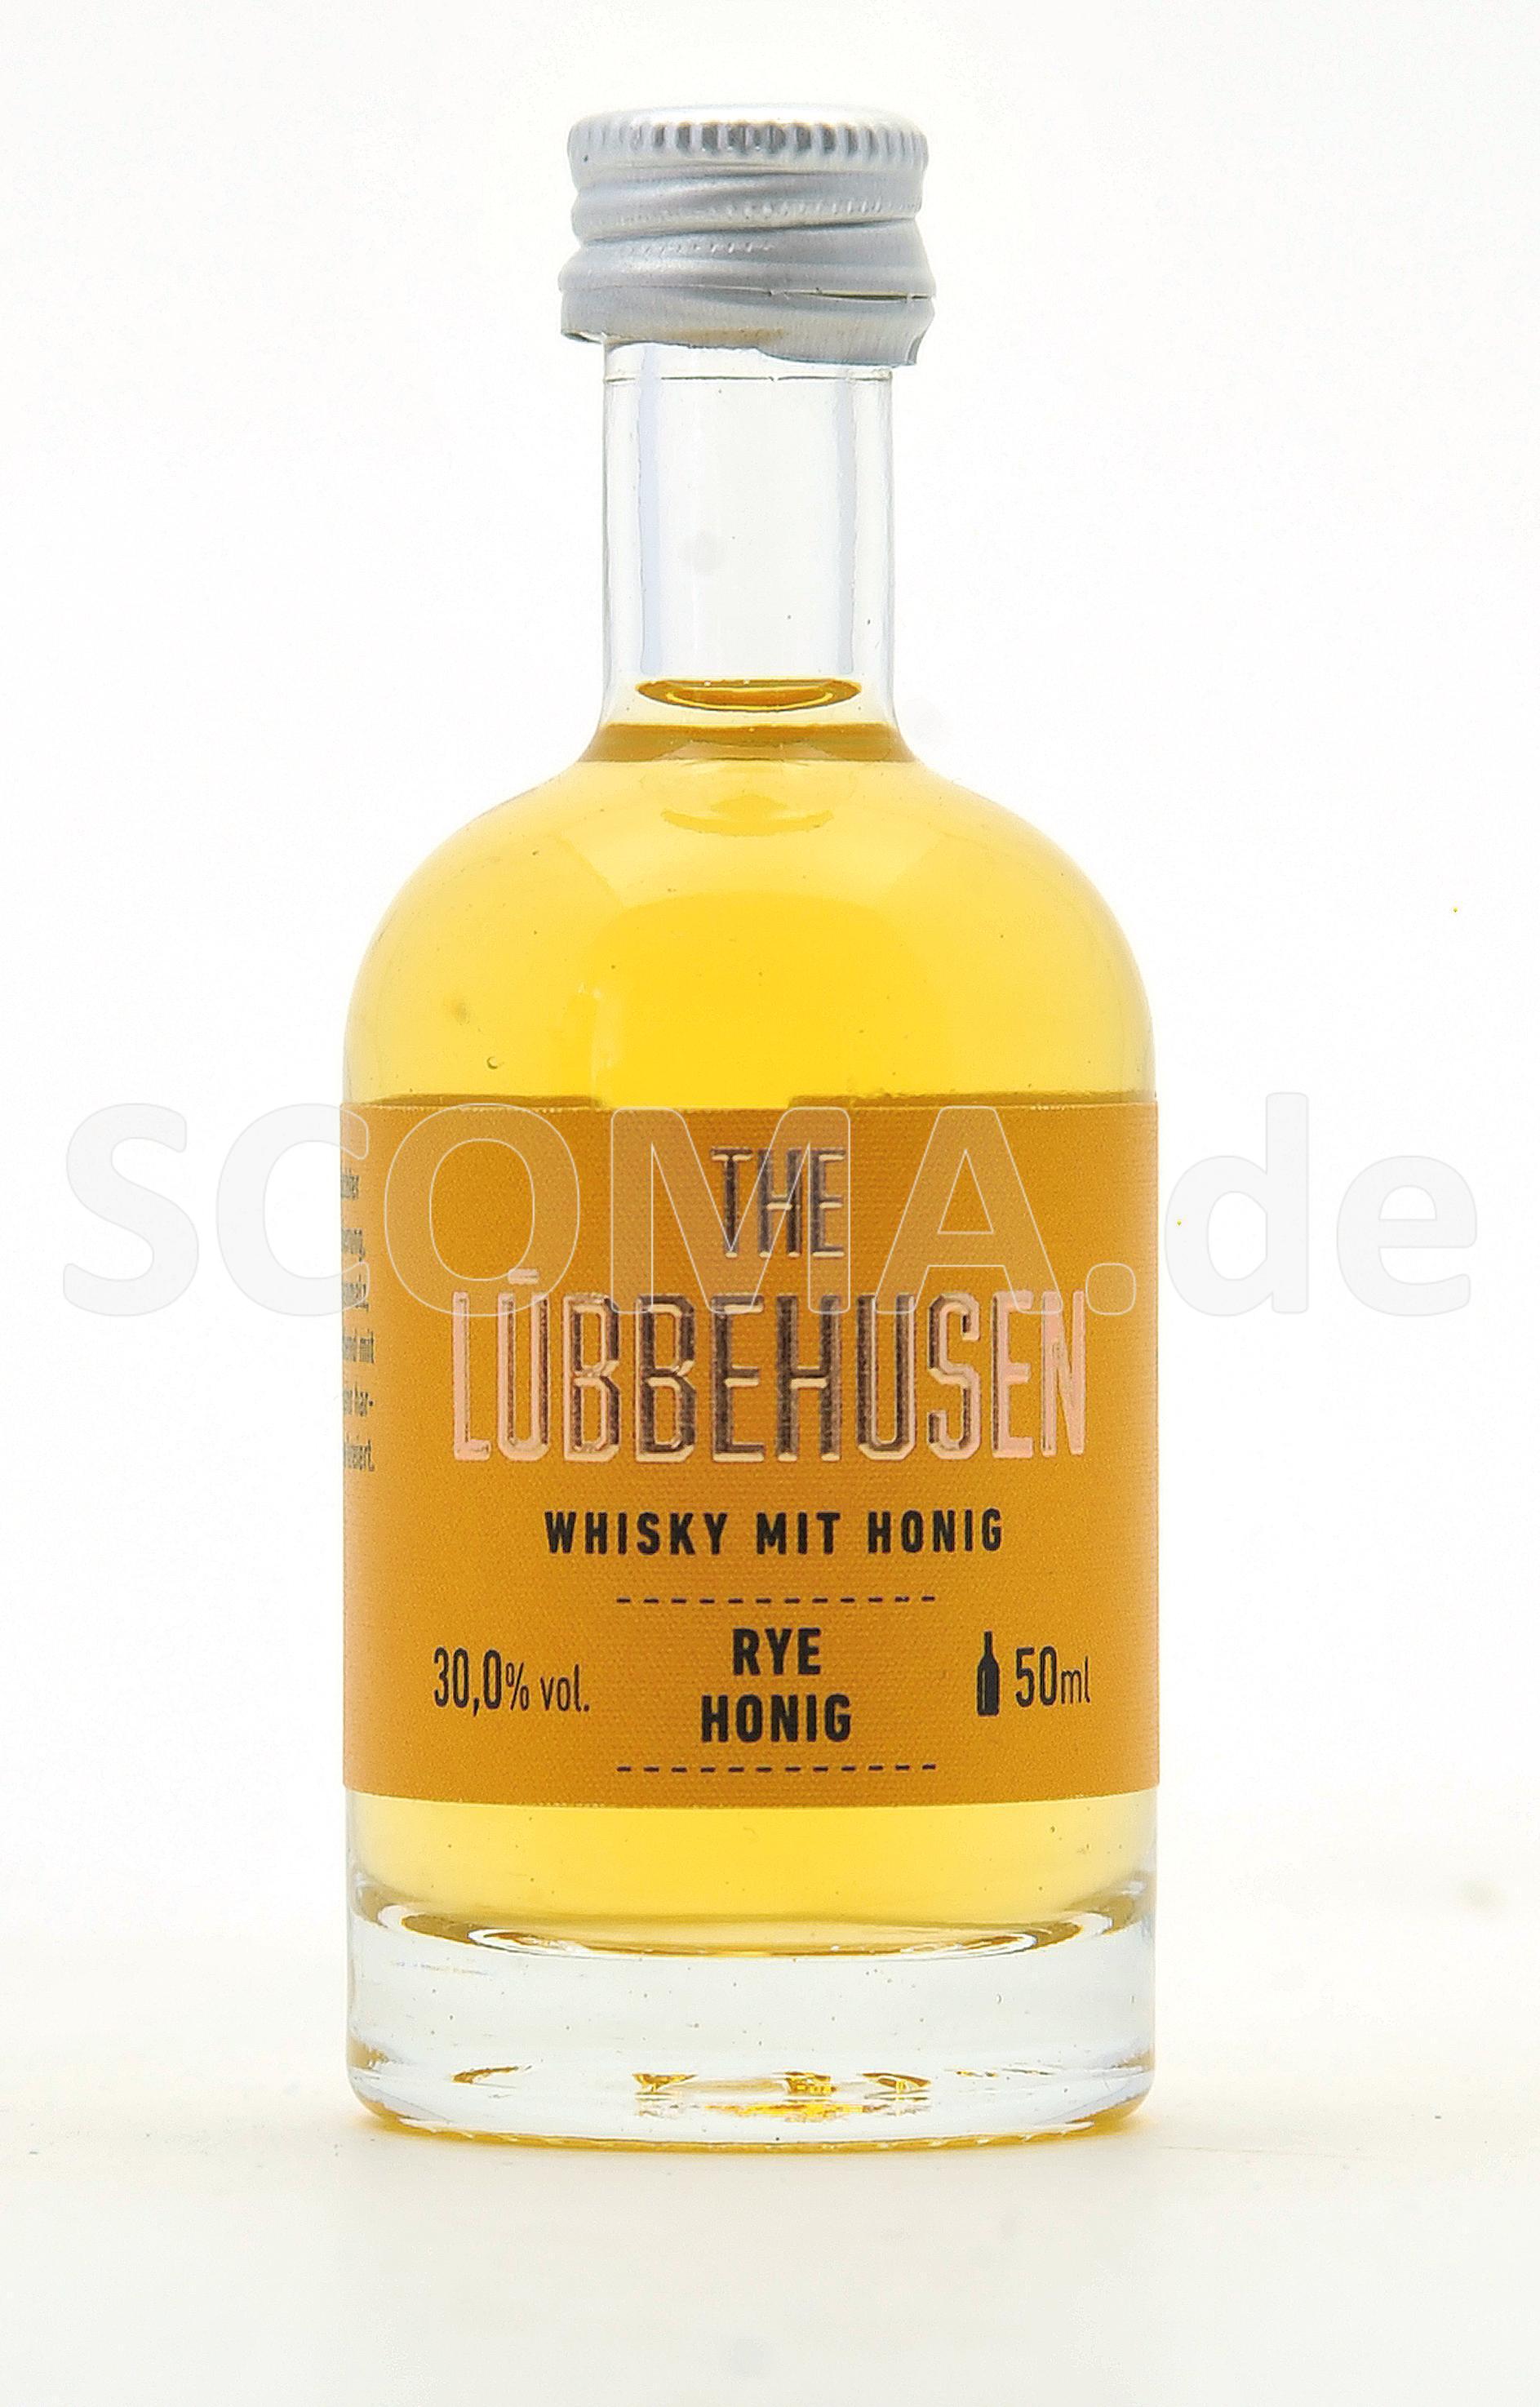 The Lübbehusen Rye - Honig Wh...